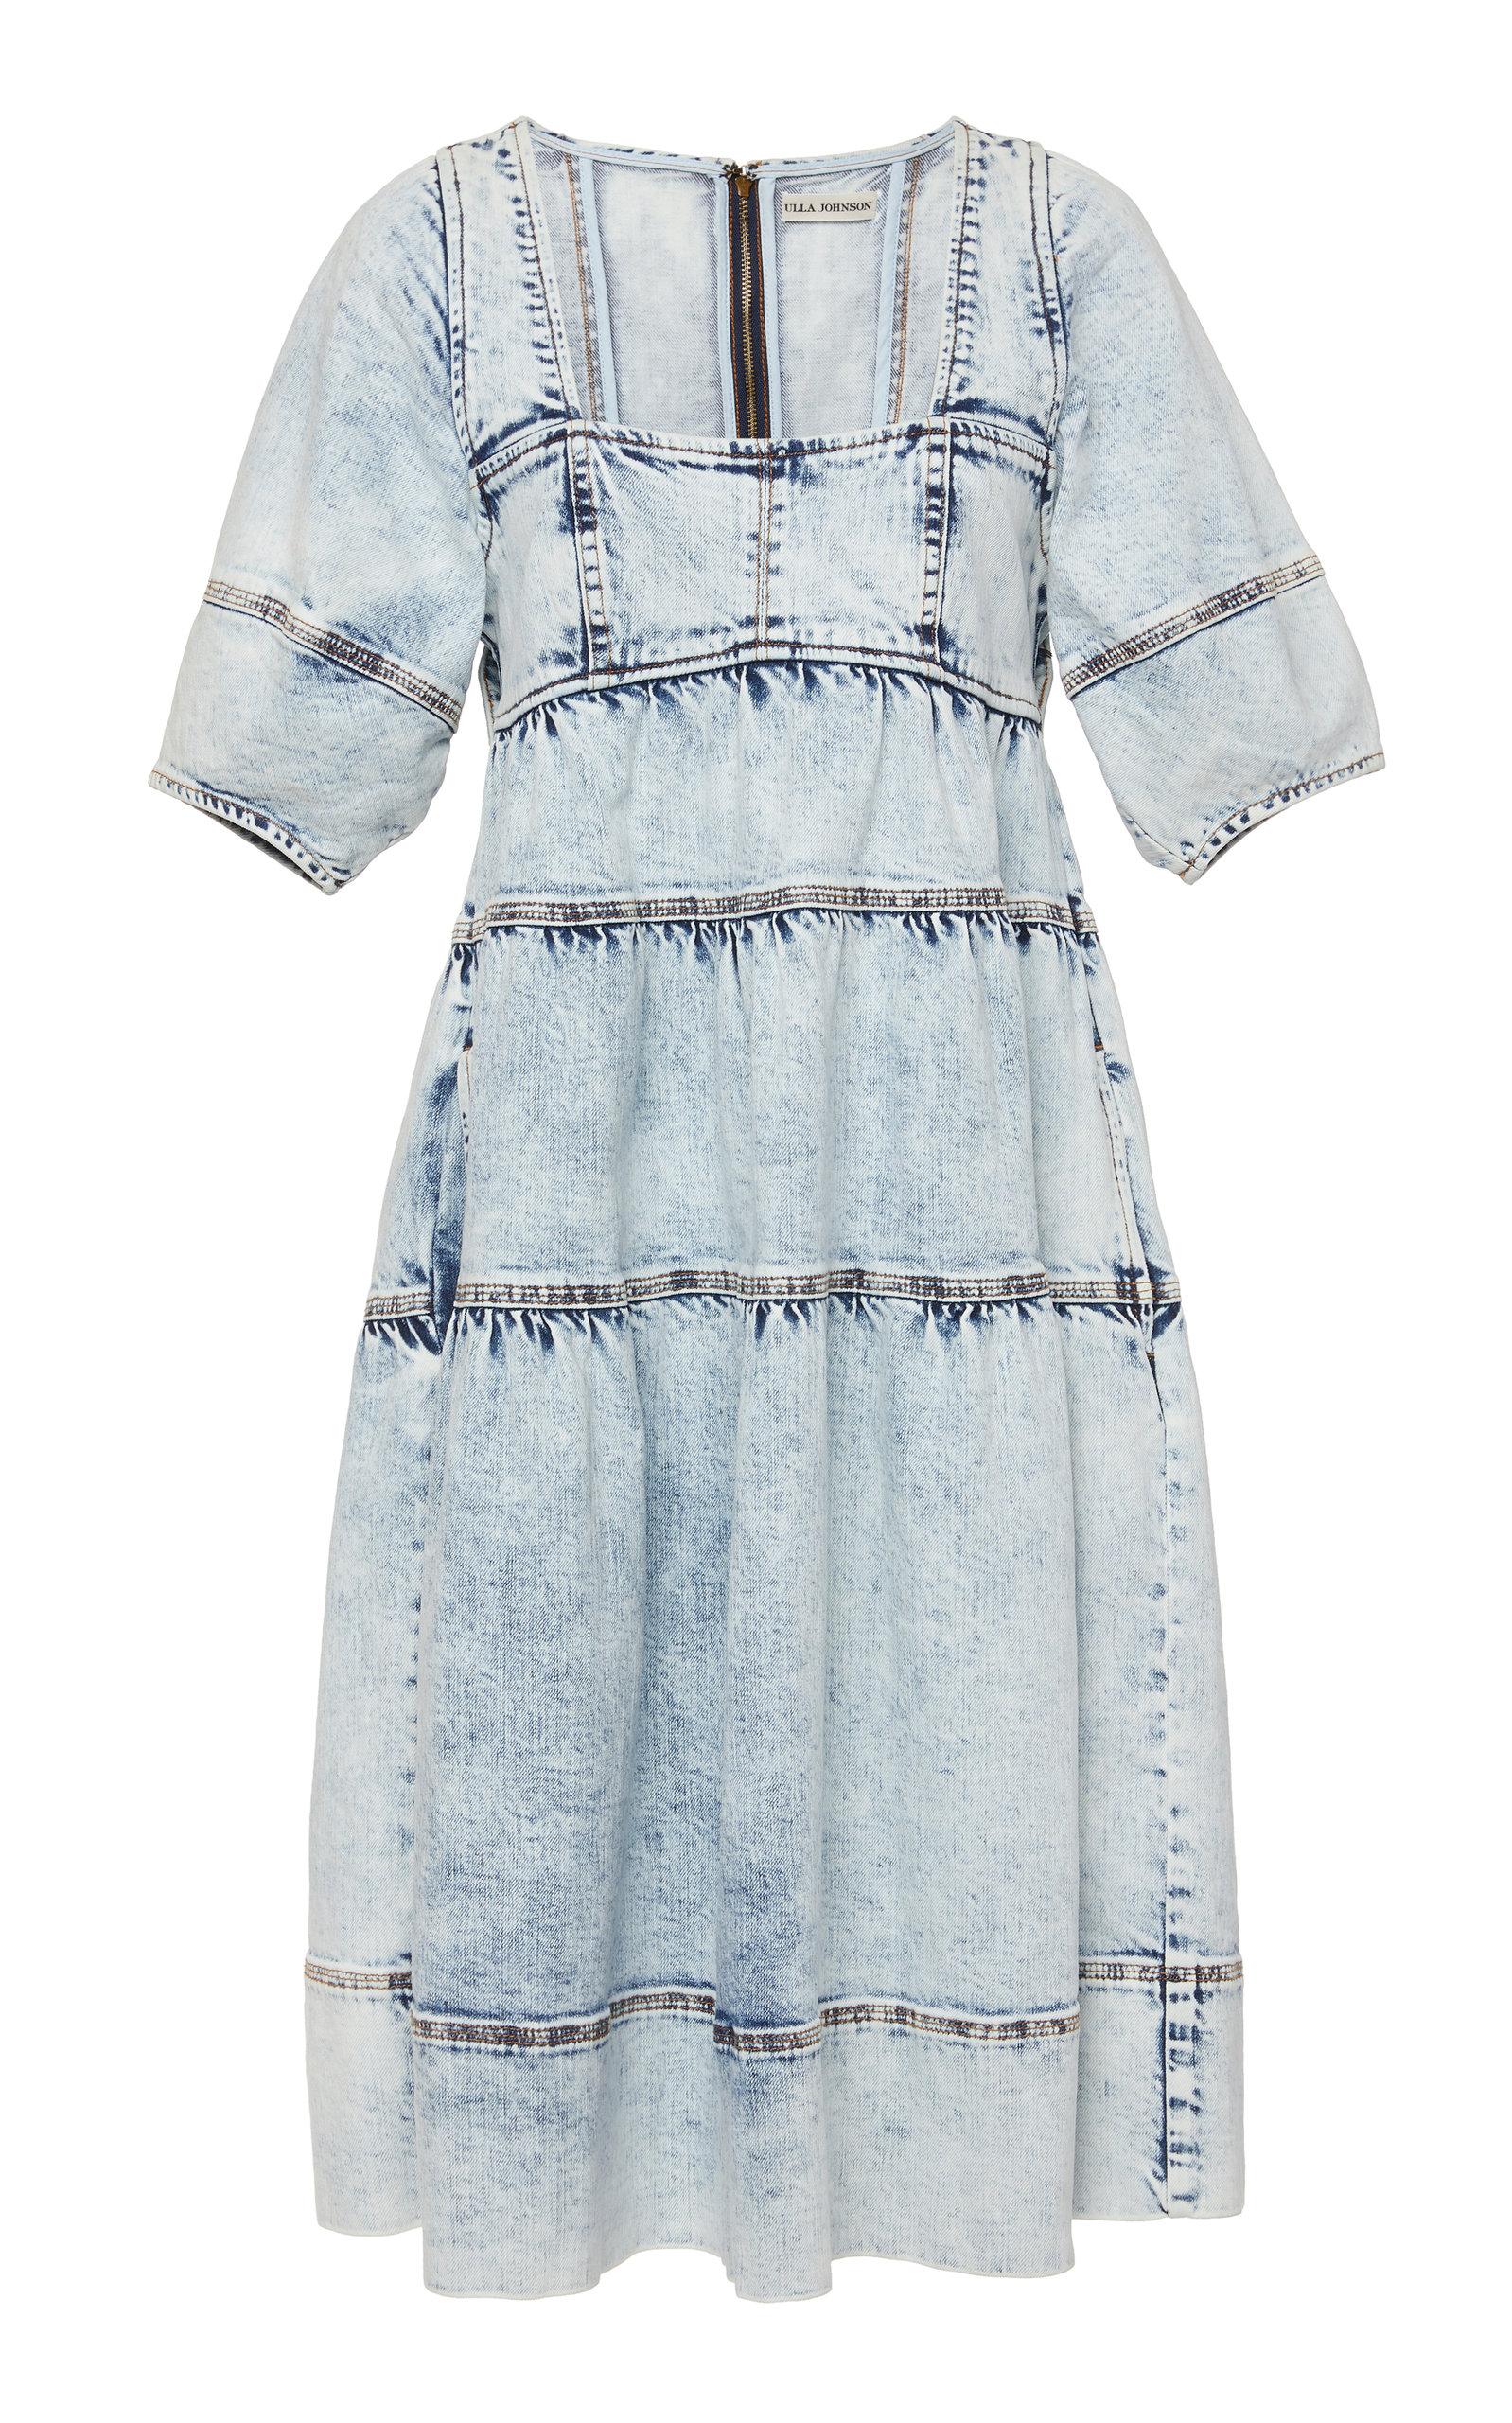 eda463237ac Ulla JohnsonDevi Acid Wash Denim Midi Dress. CLOSE. Loading